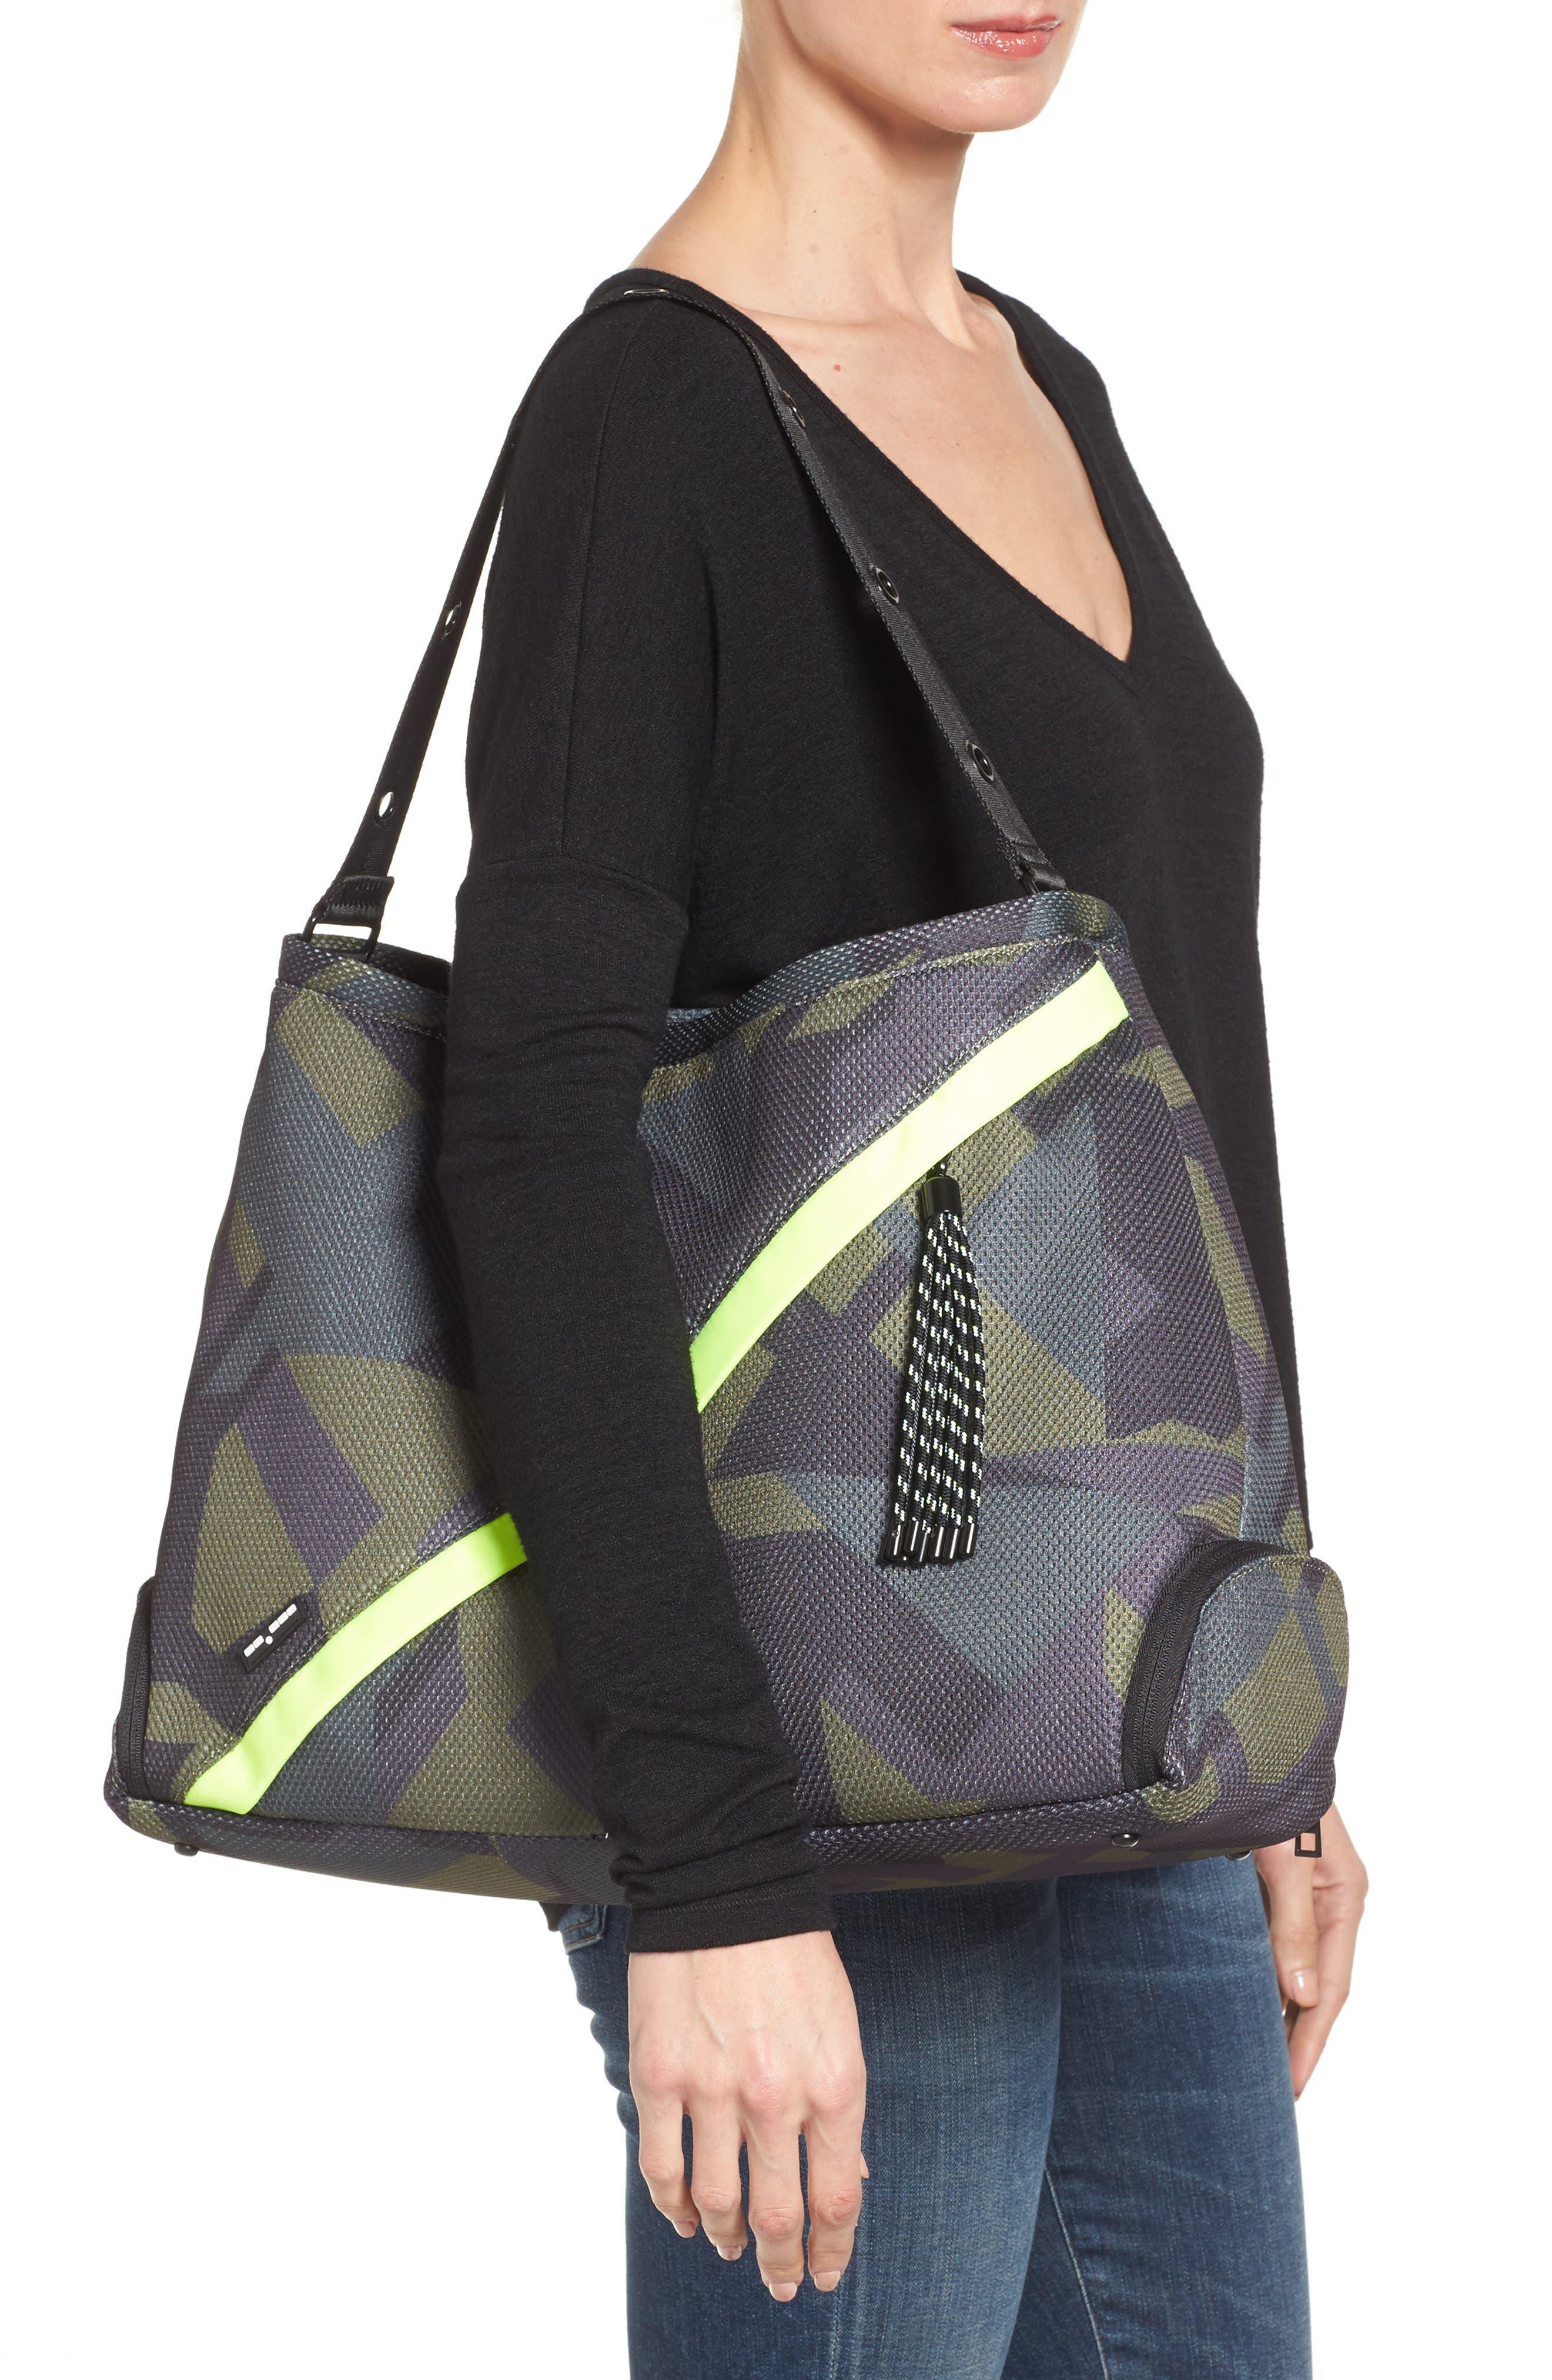 Infinity Water Resistant Bag,                             Alternate thumbnail 2, color,                             300